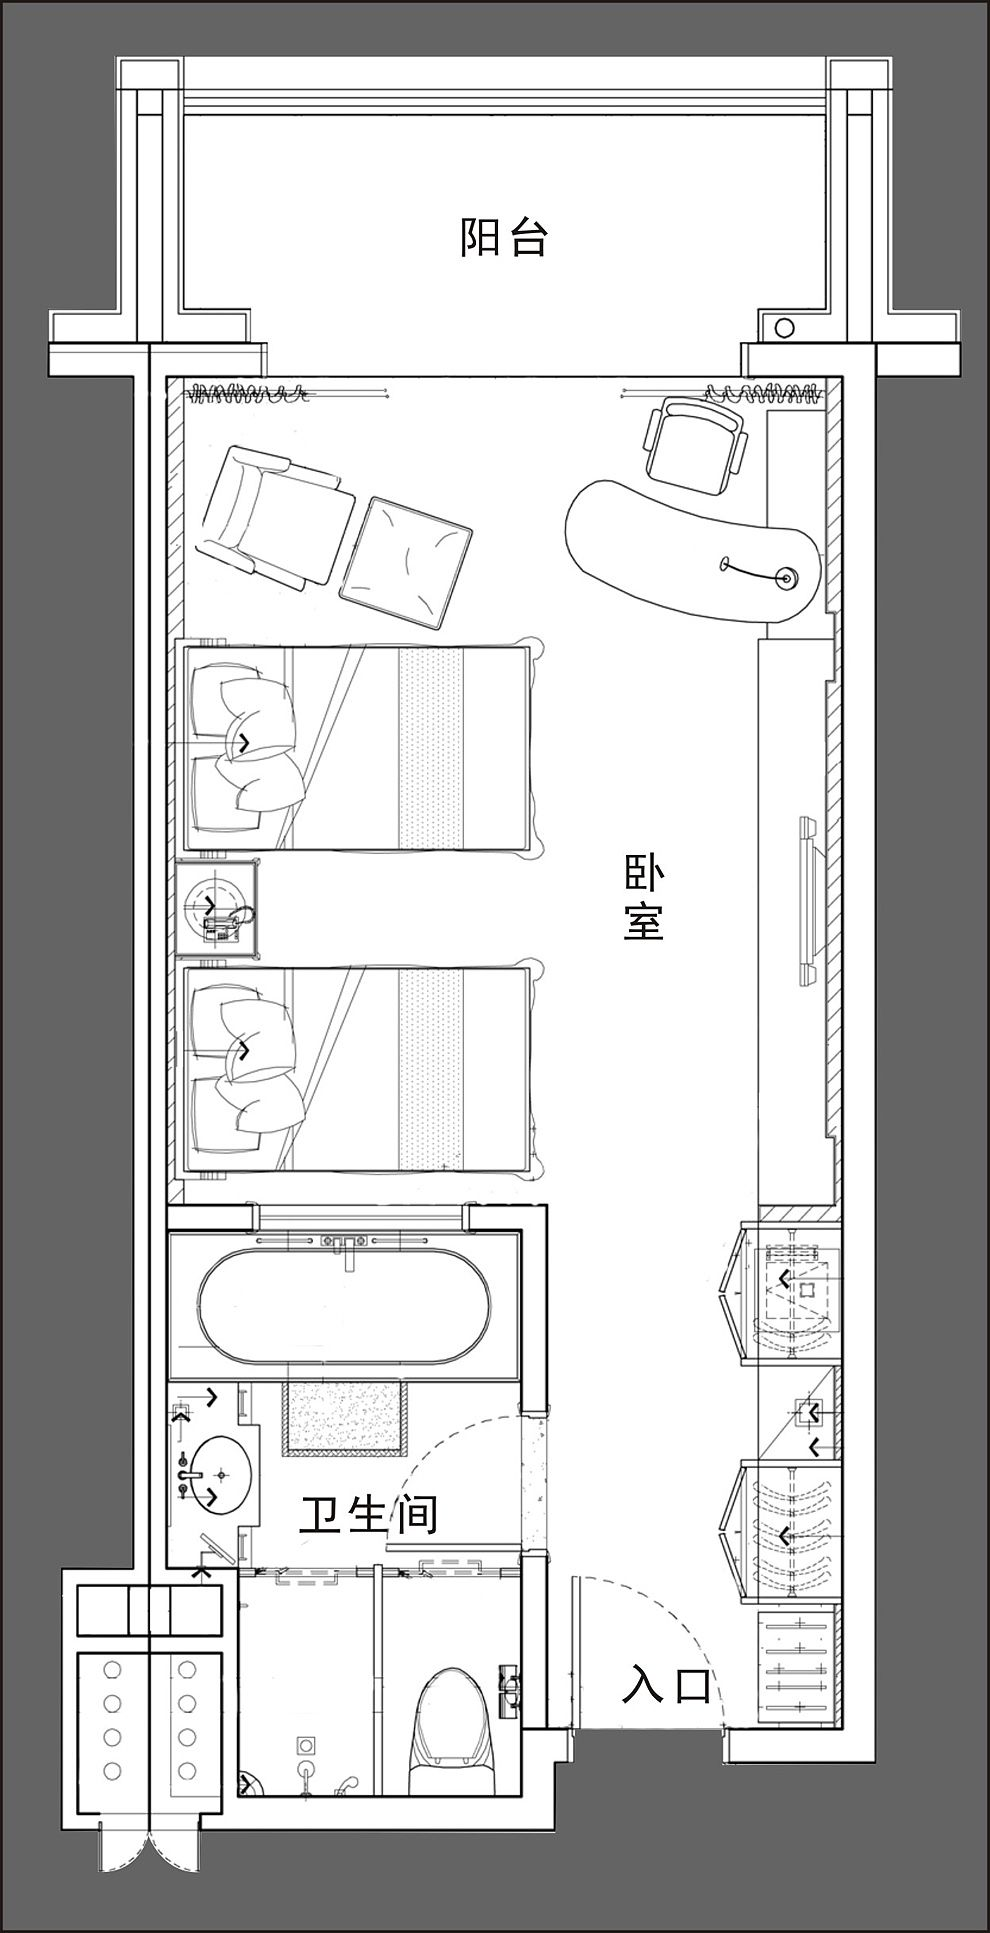 Quin Shan Hotel Suzhou Deluxe Twin 35 39 Hotel Room Design Plan Hotel Room Design Hotel Floor Plan